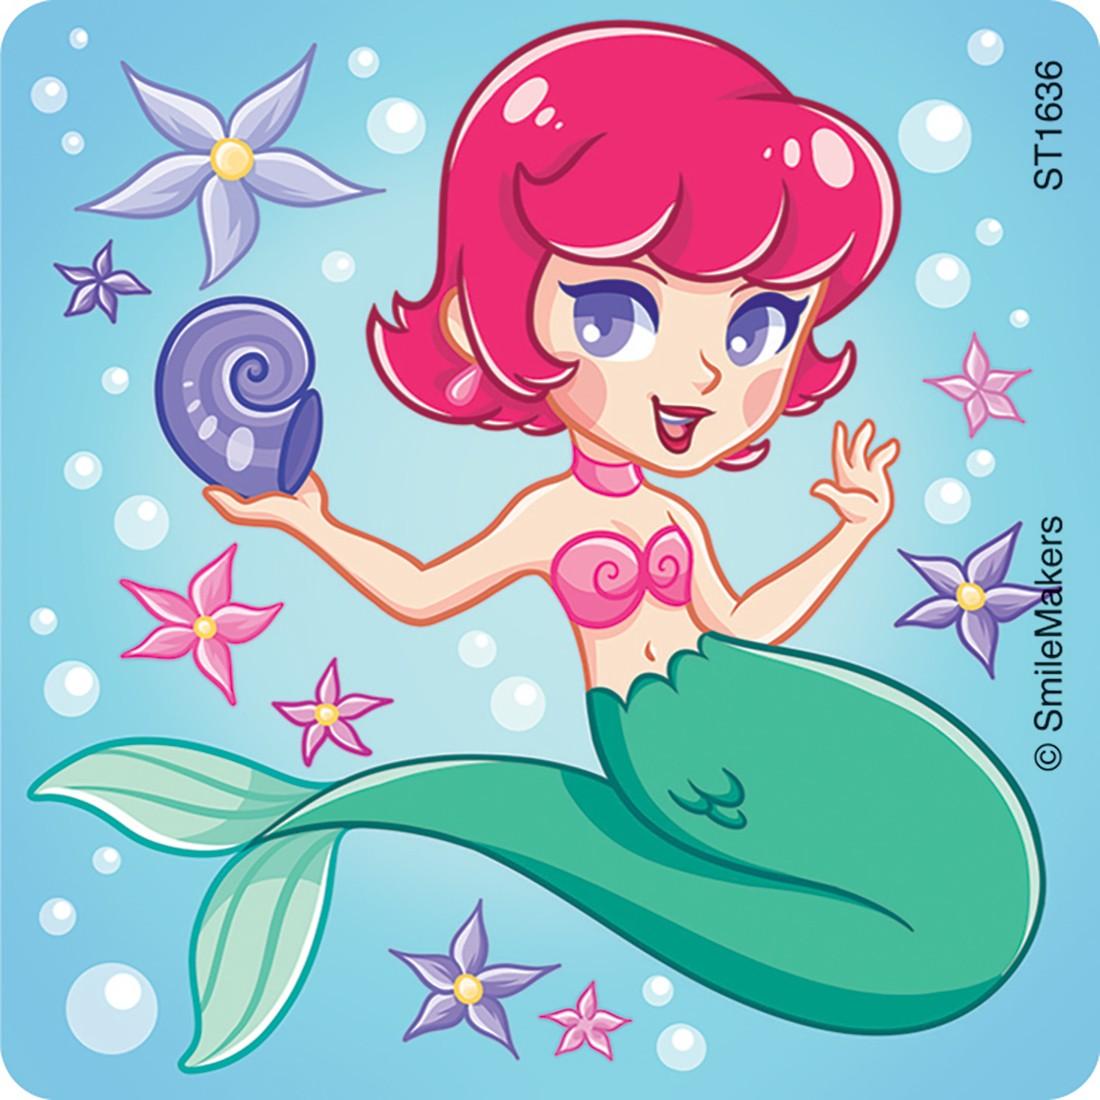 Mermaid Stickers [image]